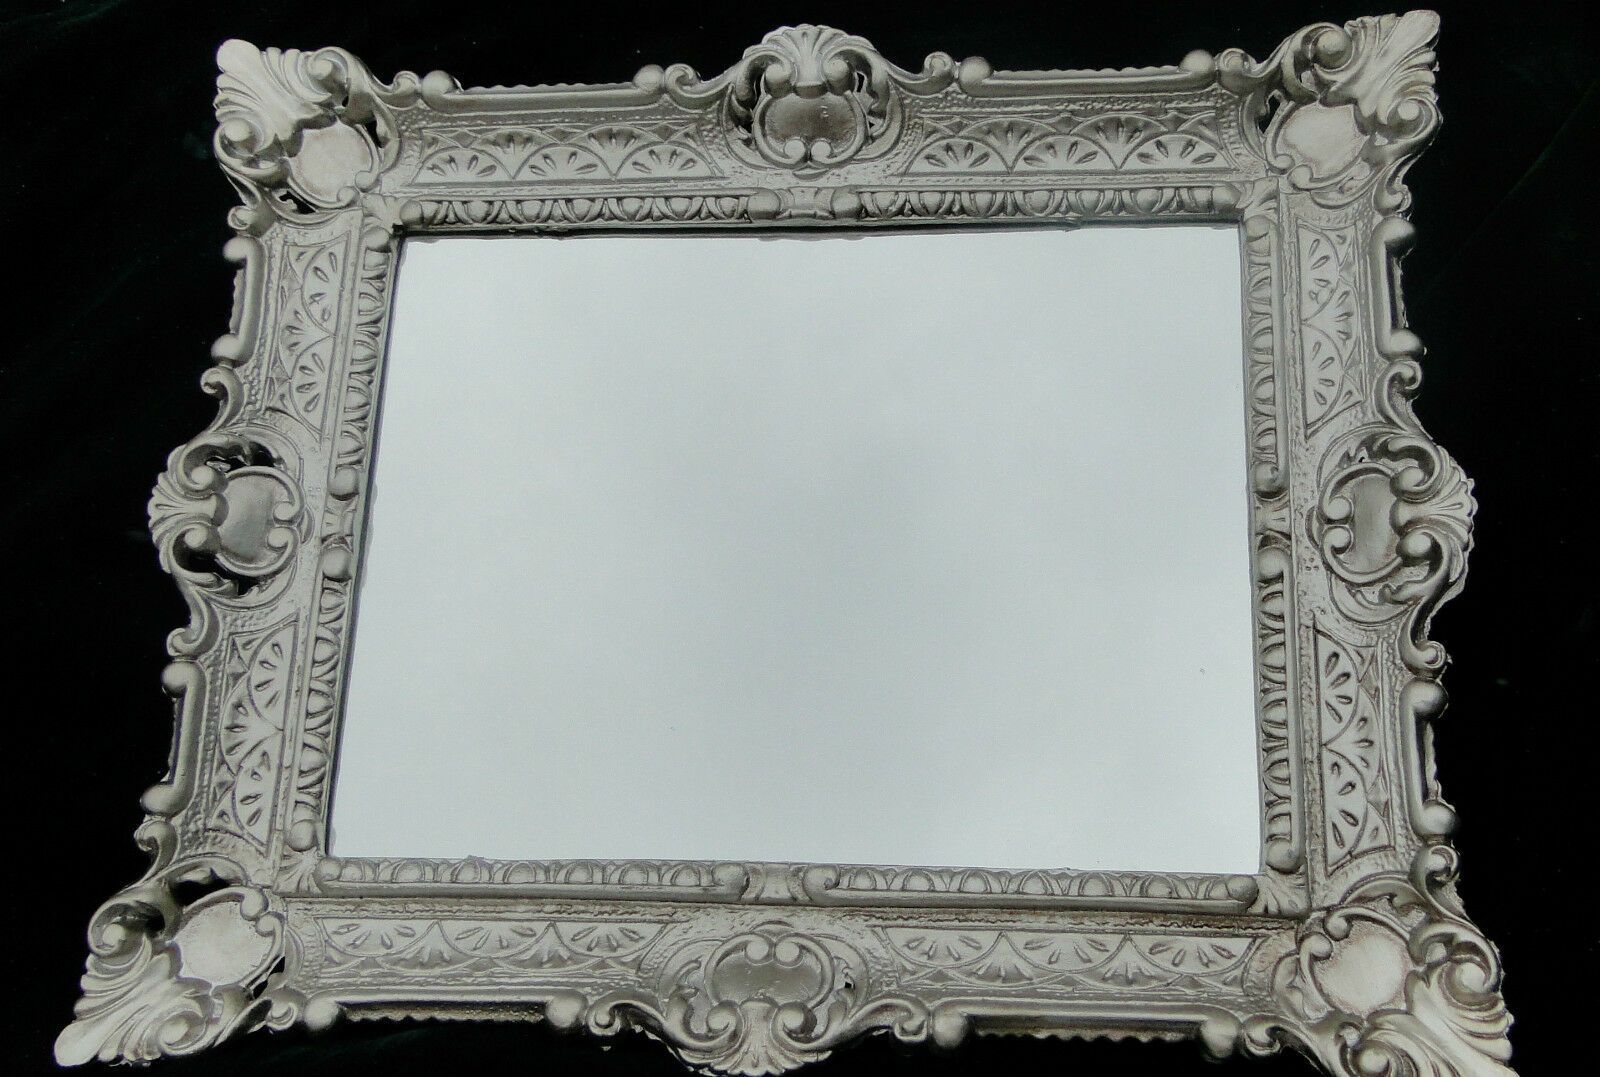 Wandspiegel Barock Spiegel Antik Silber Wanddeko Badspiegel 46x56